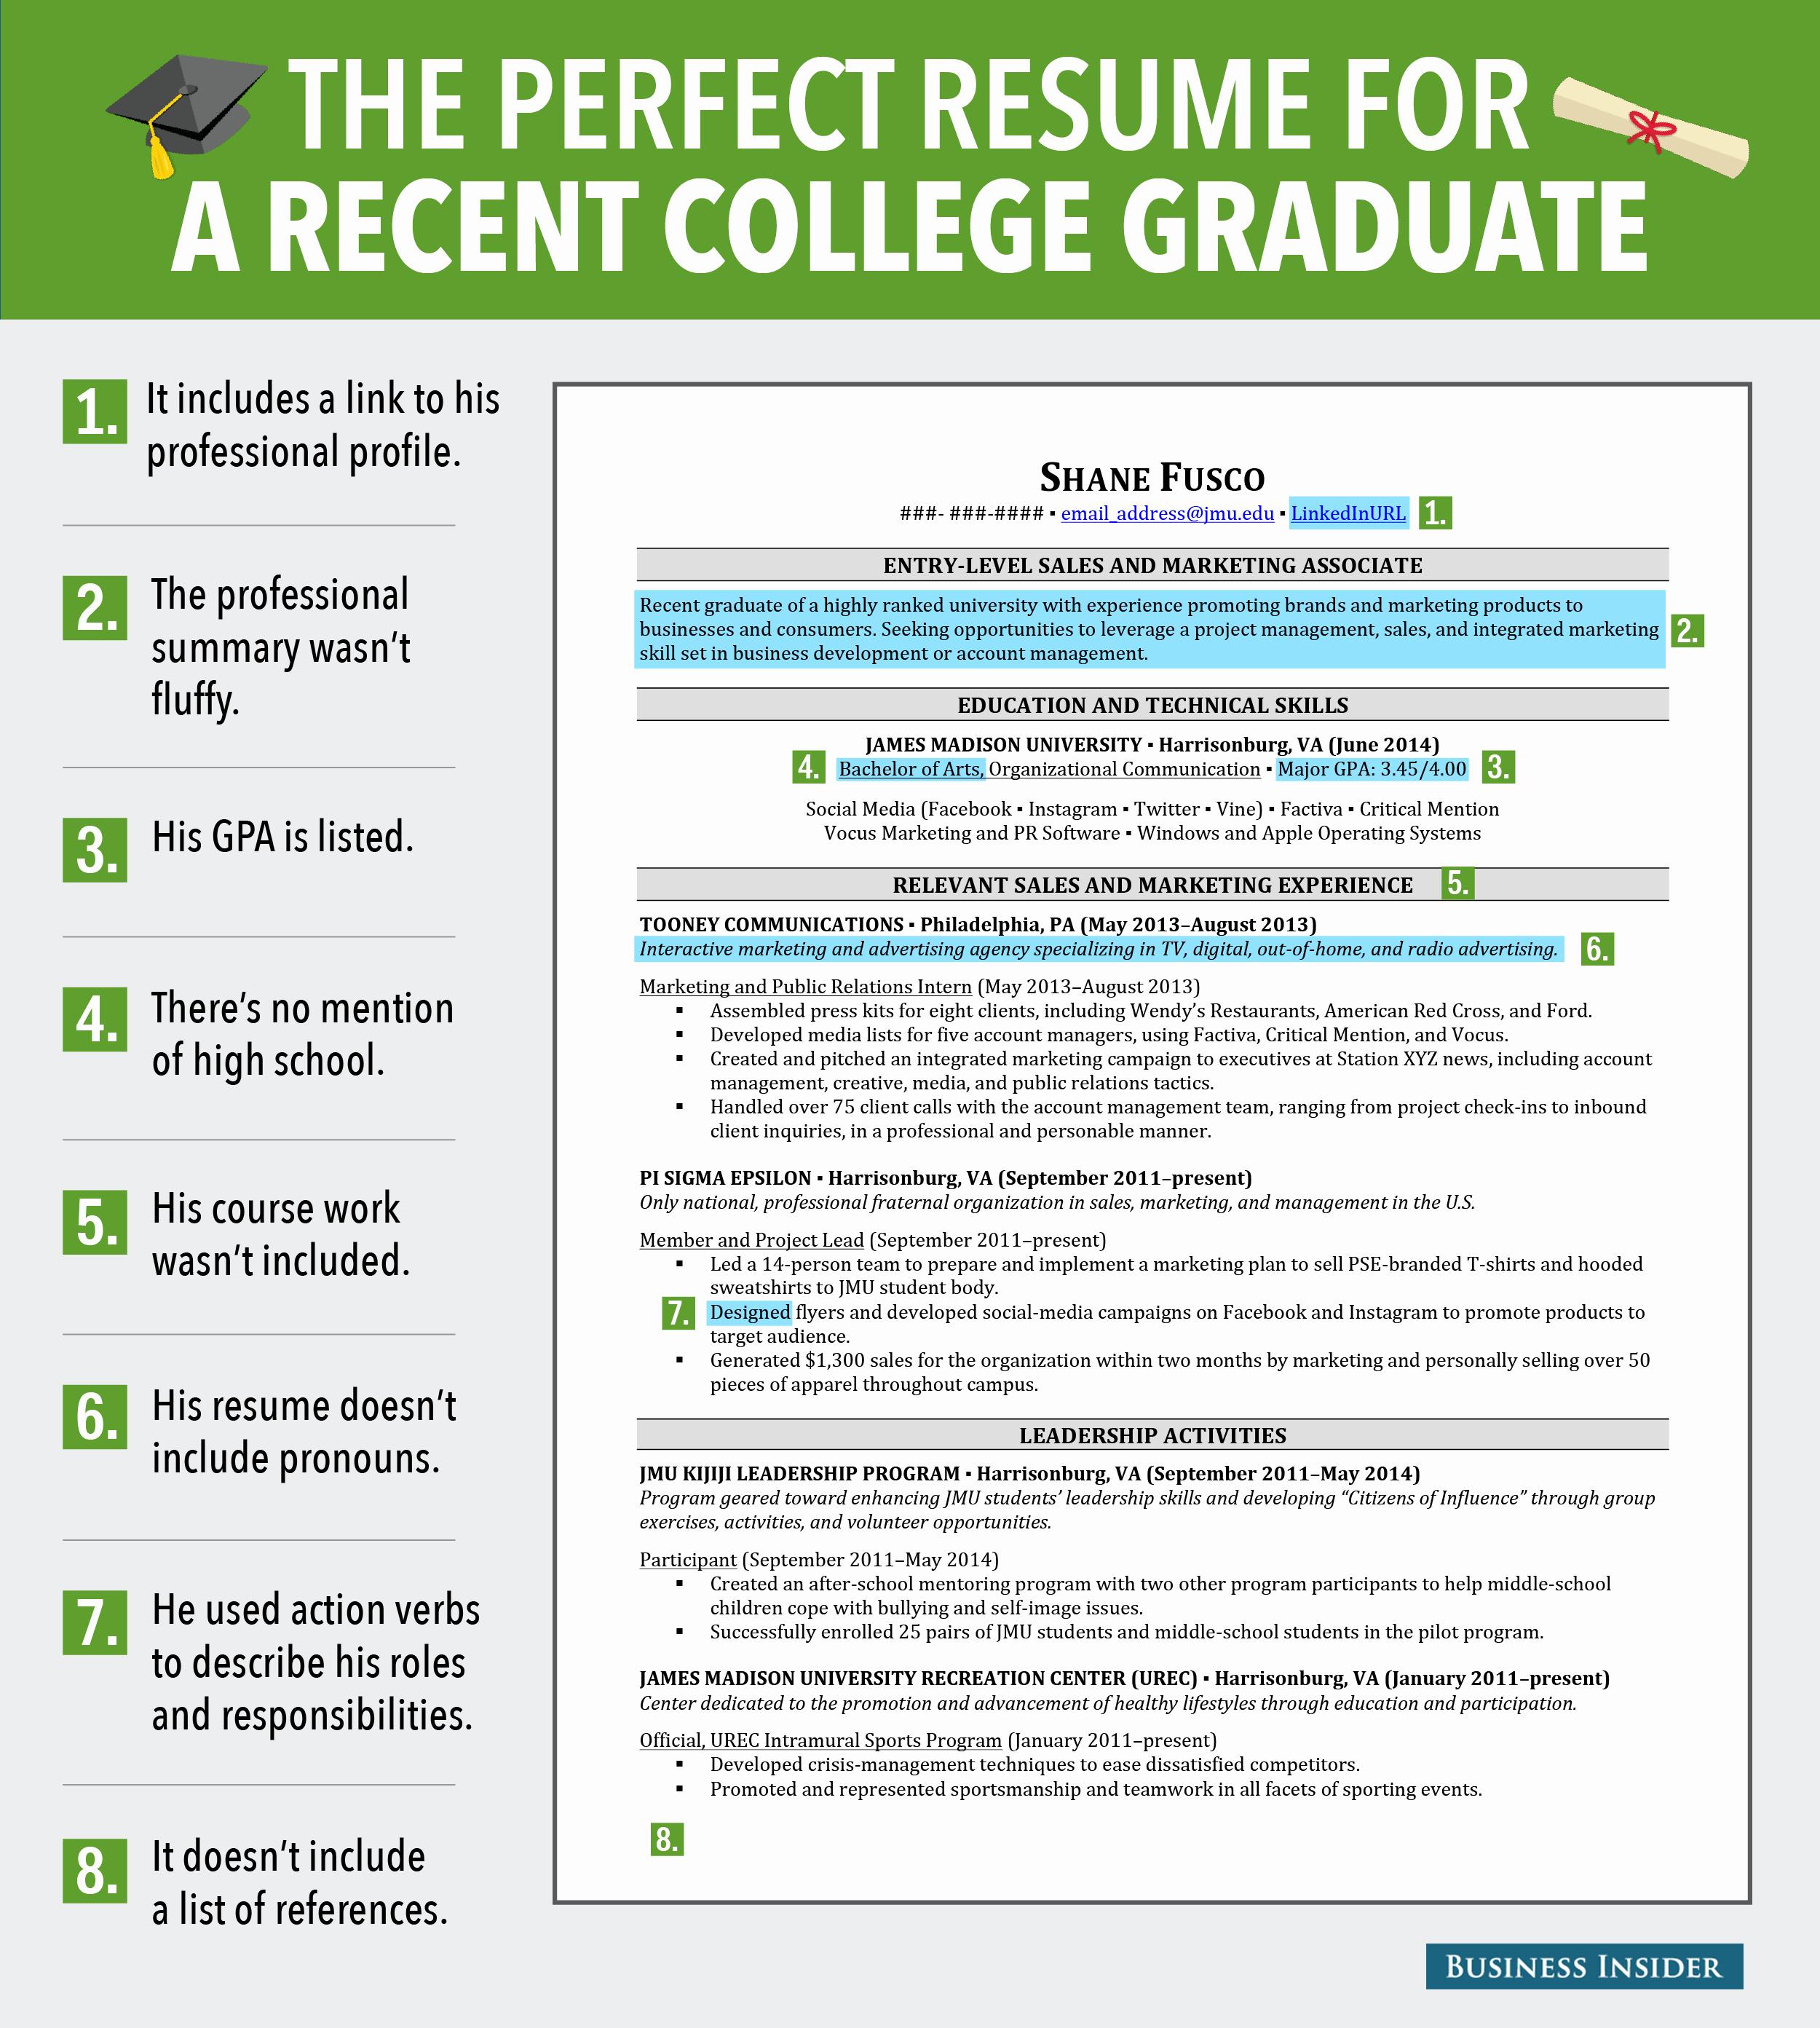 College Graduate Resume Template Unique Excellent Resume for Recent Grad Business Insider